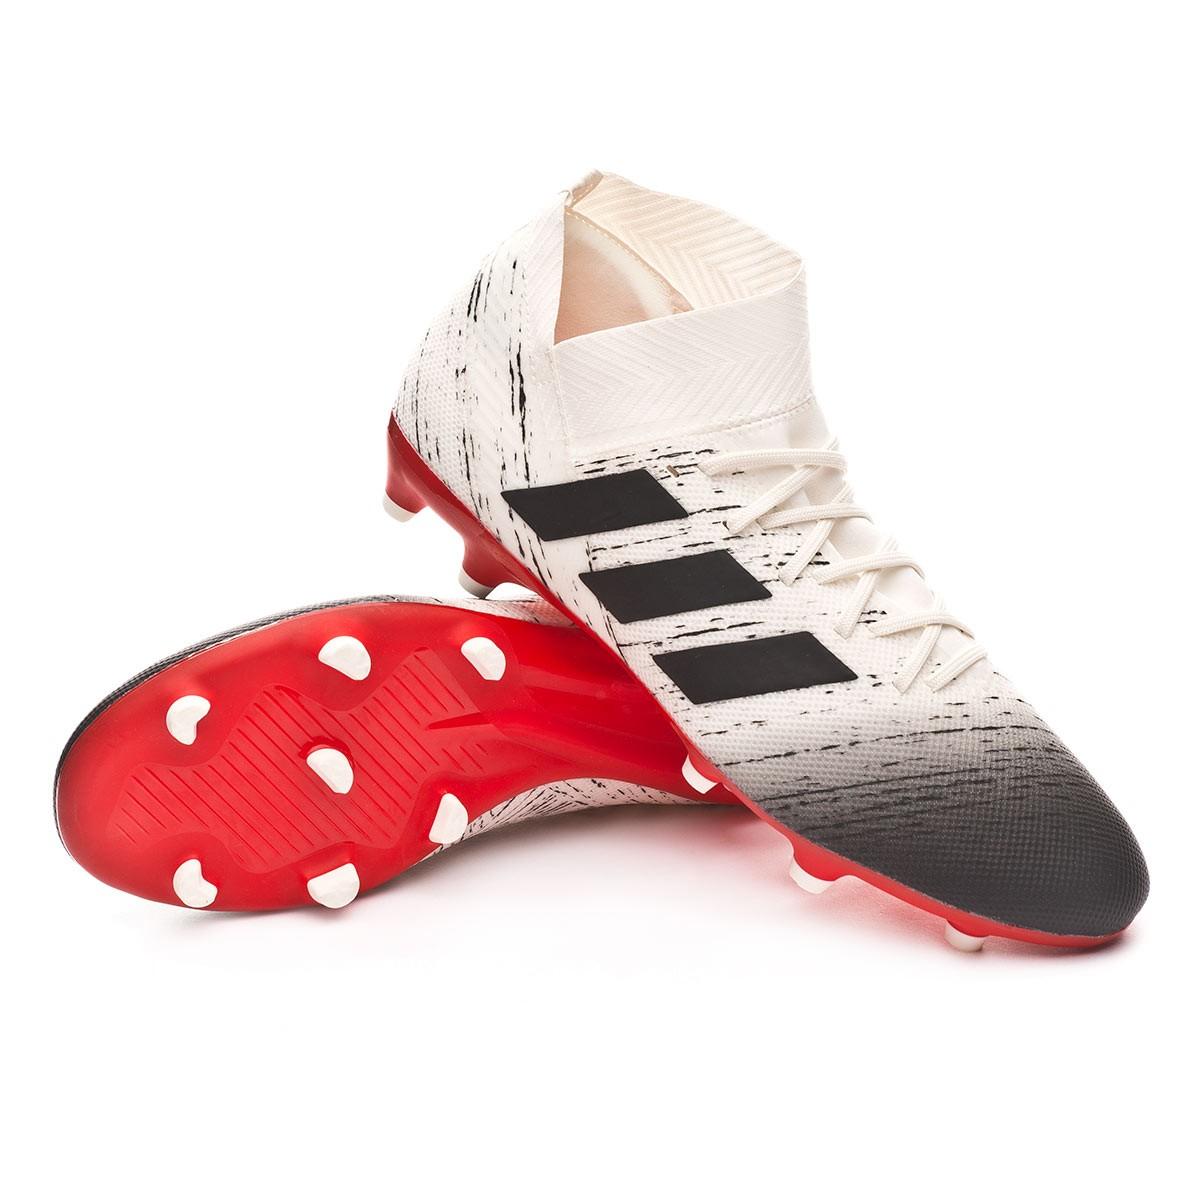 ... Bota Nemeziz 18.3 FG Off white-Core black-Active red. Categorías de la Bota  de fútbol 1c7b755decf18